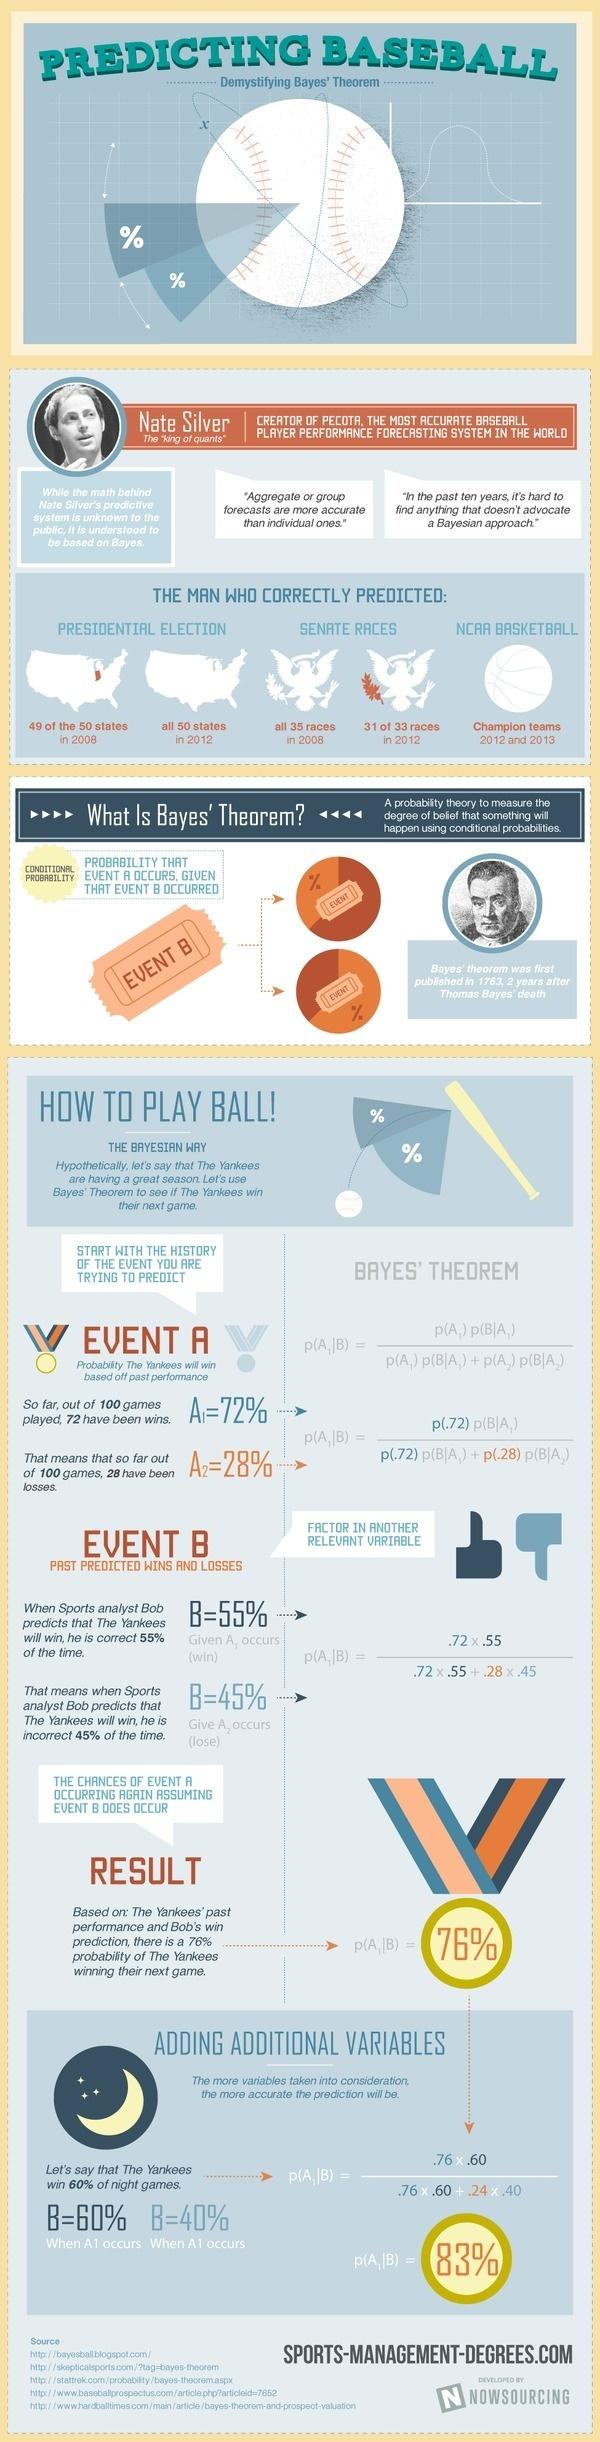 Predicting Baseball: Demystifying Bayes' Theorem #infographic